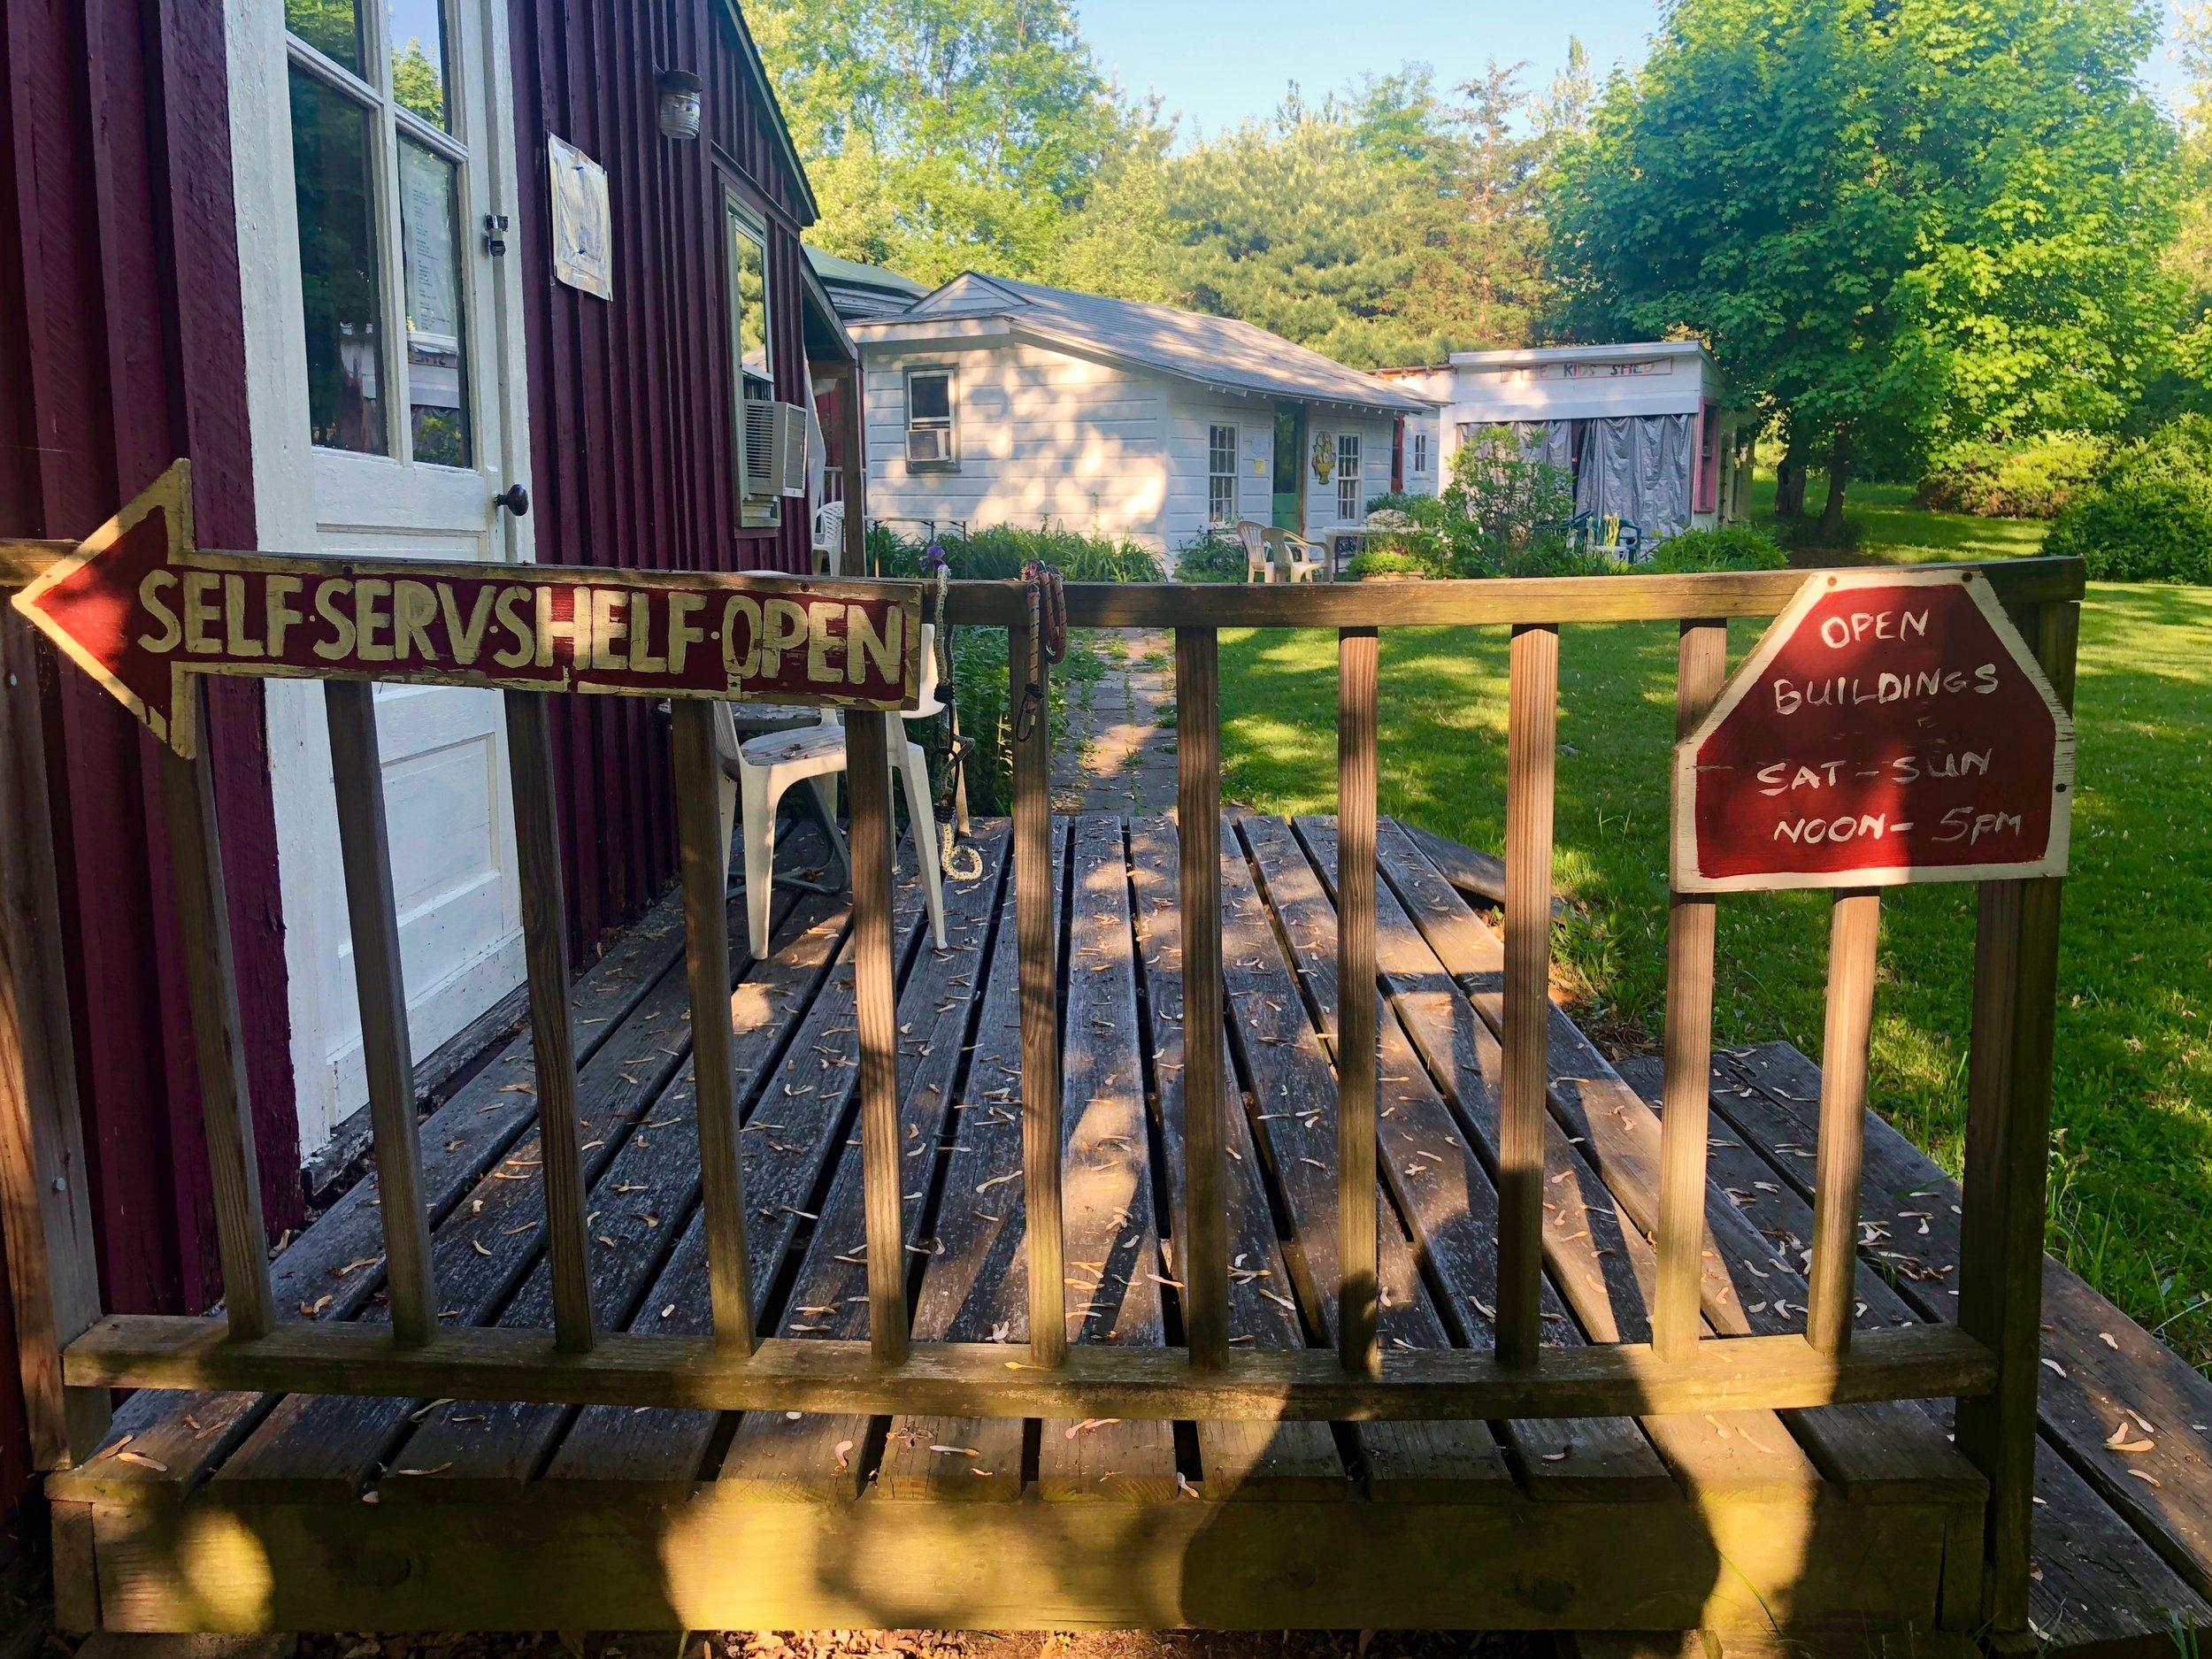 Self-serve book shop near Hudson